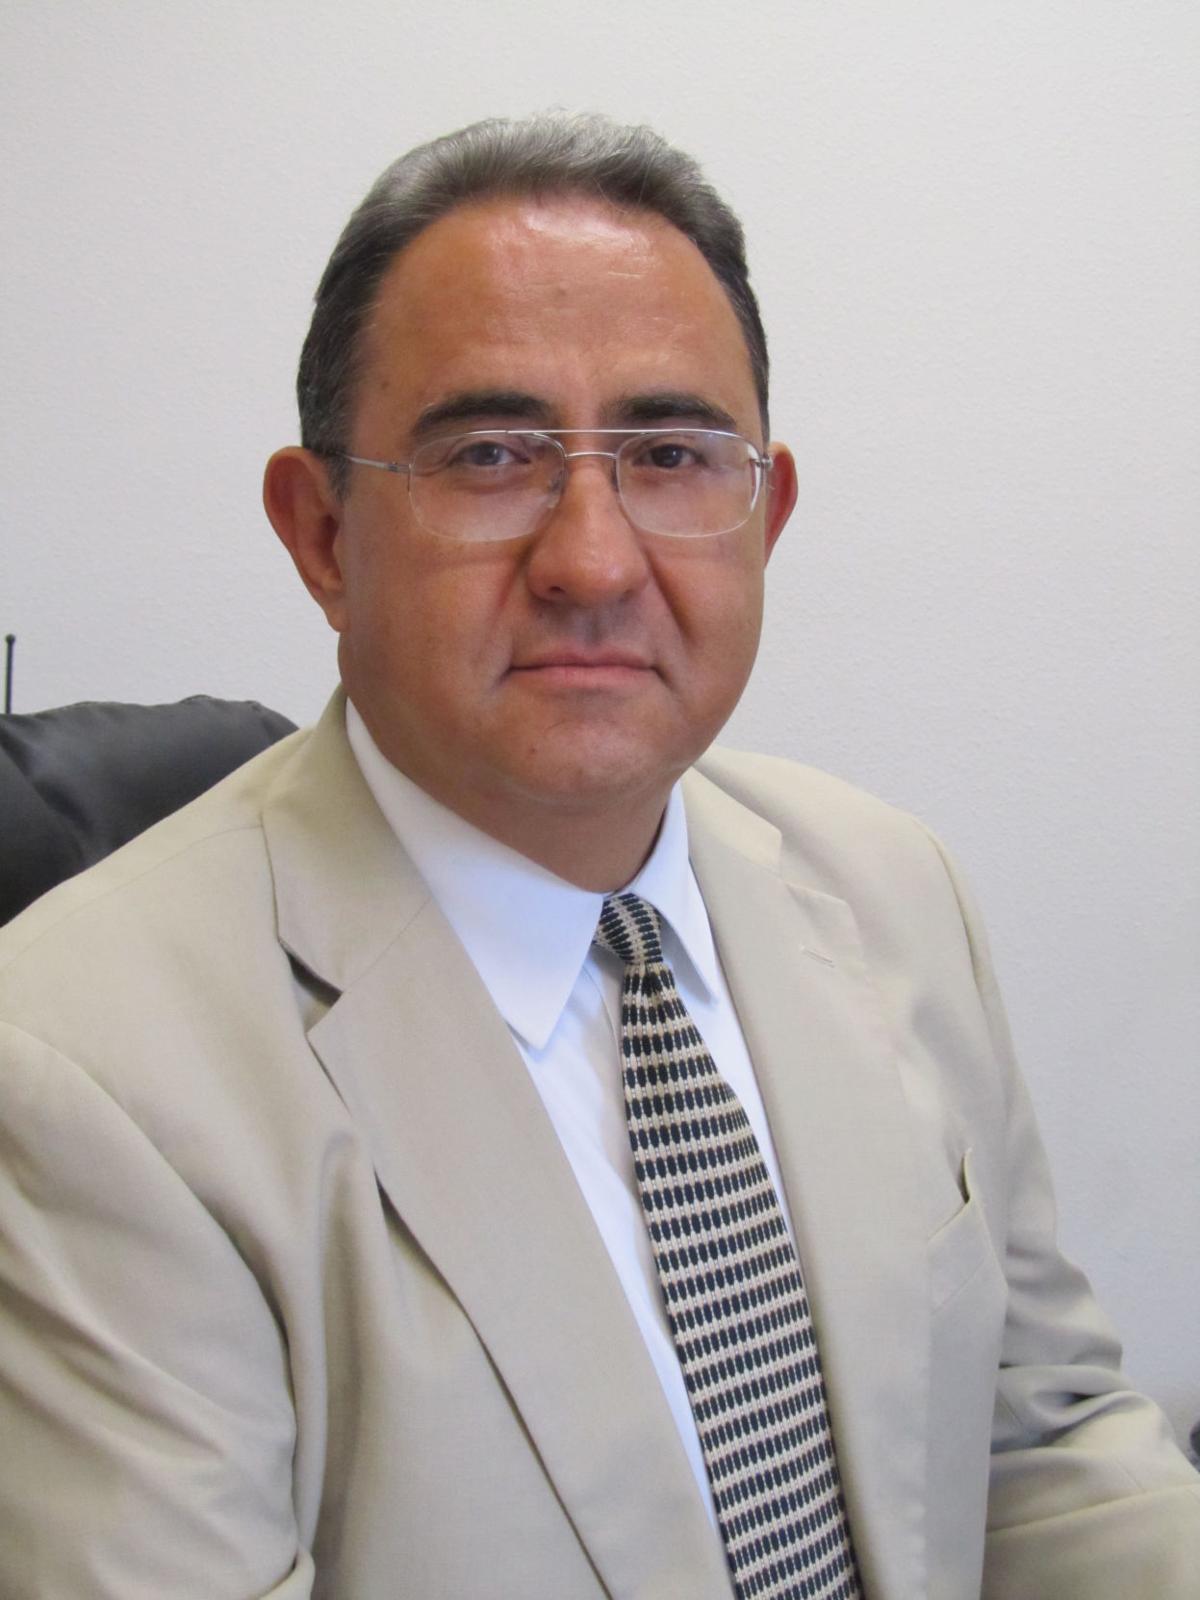 Dr. Fernando Gonzalez